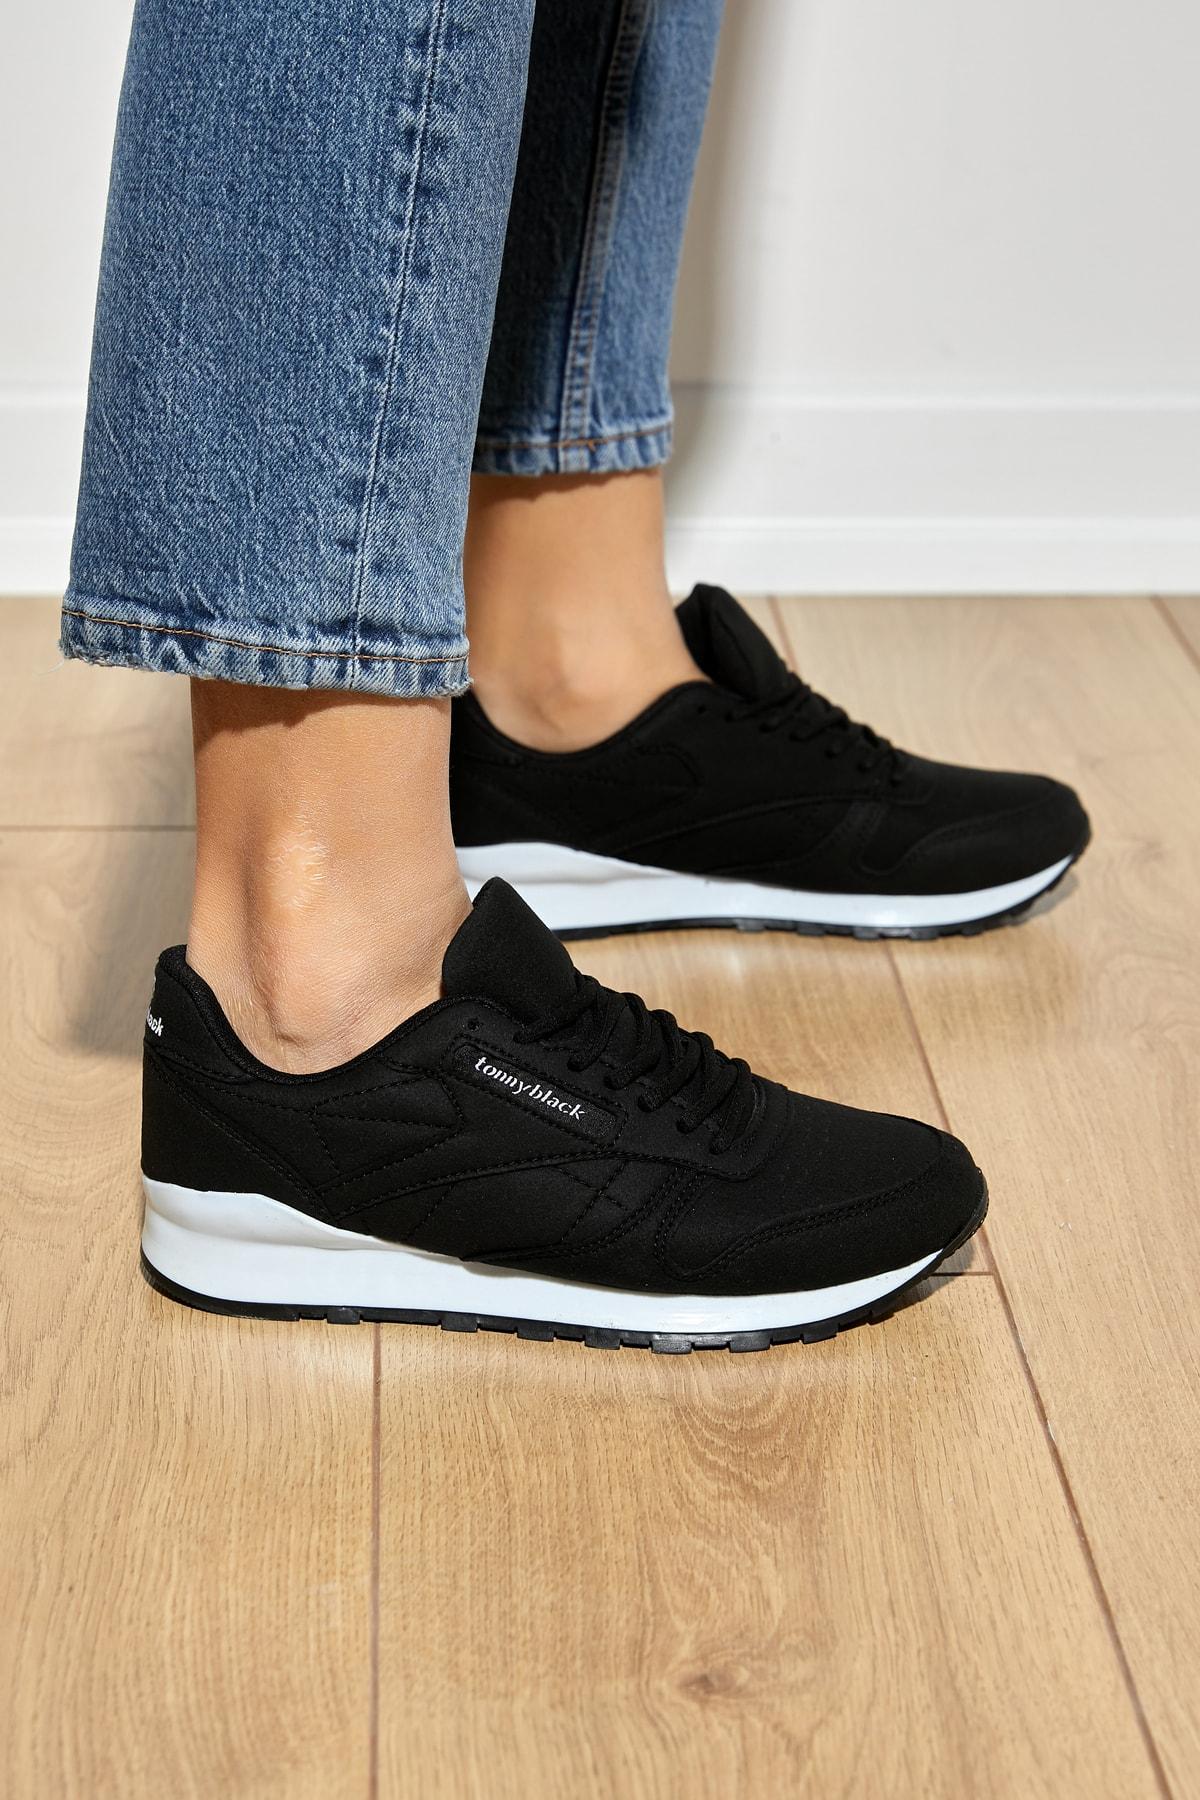 Unısex Spor Ayakkabı Siyah V2106 -> 37 -> Siyah